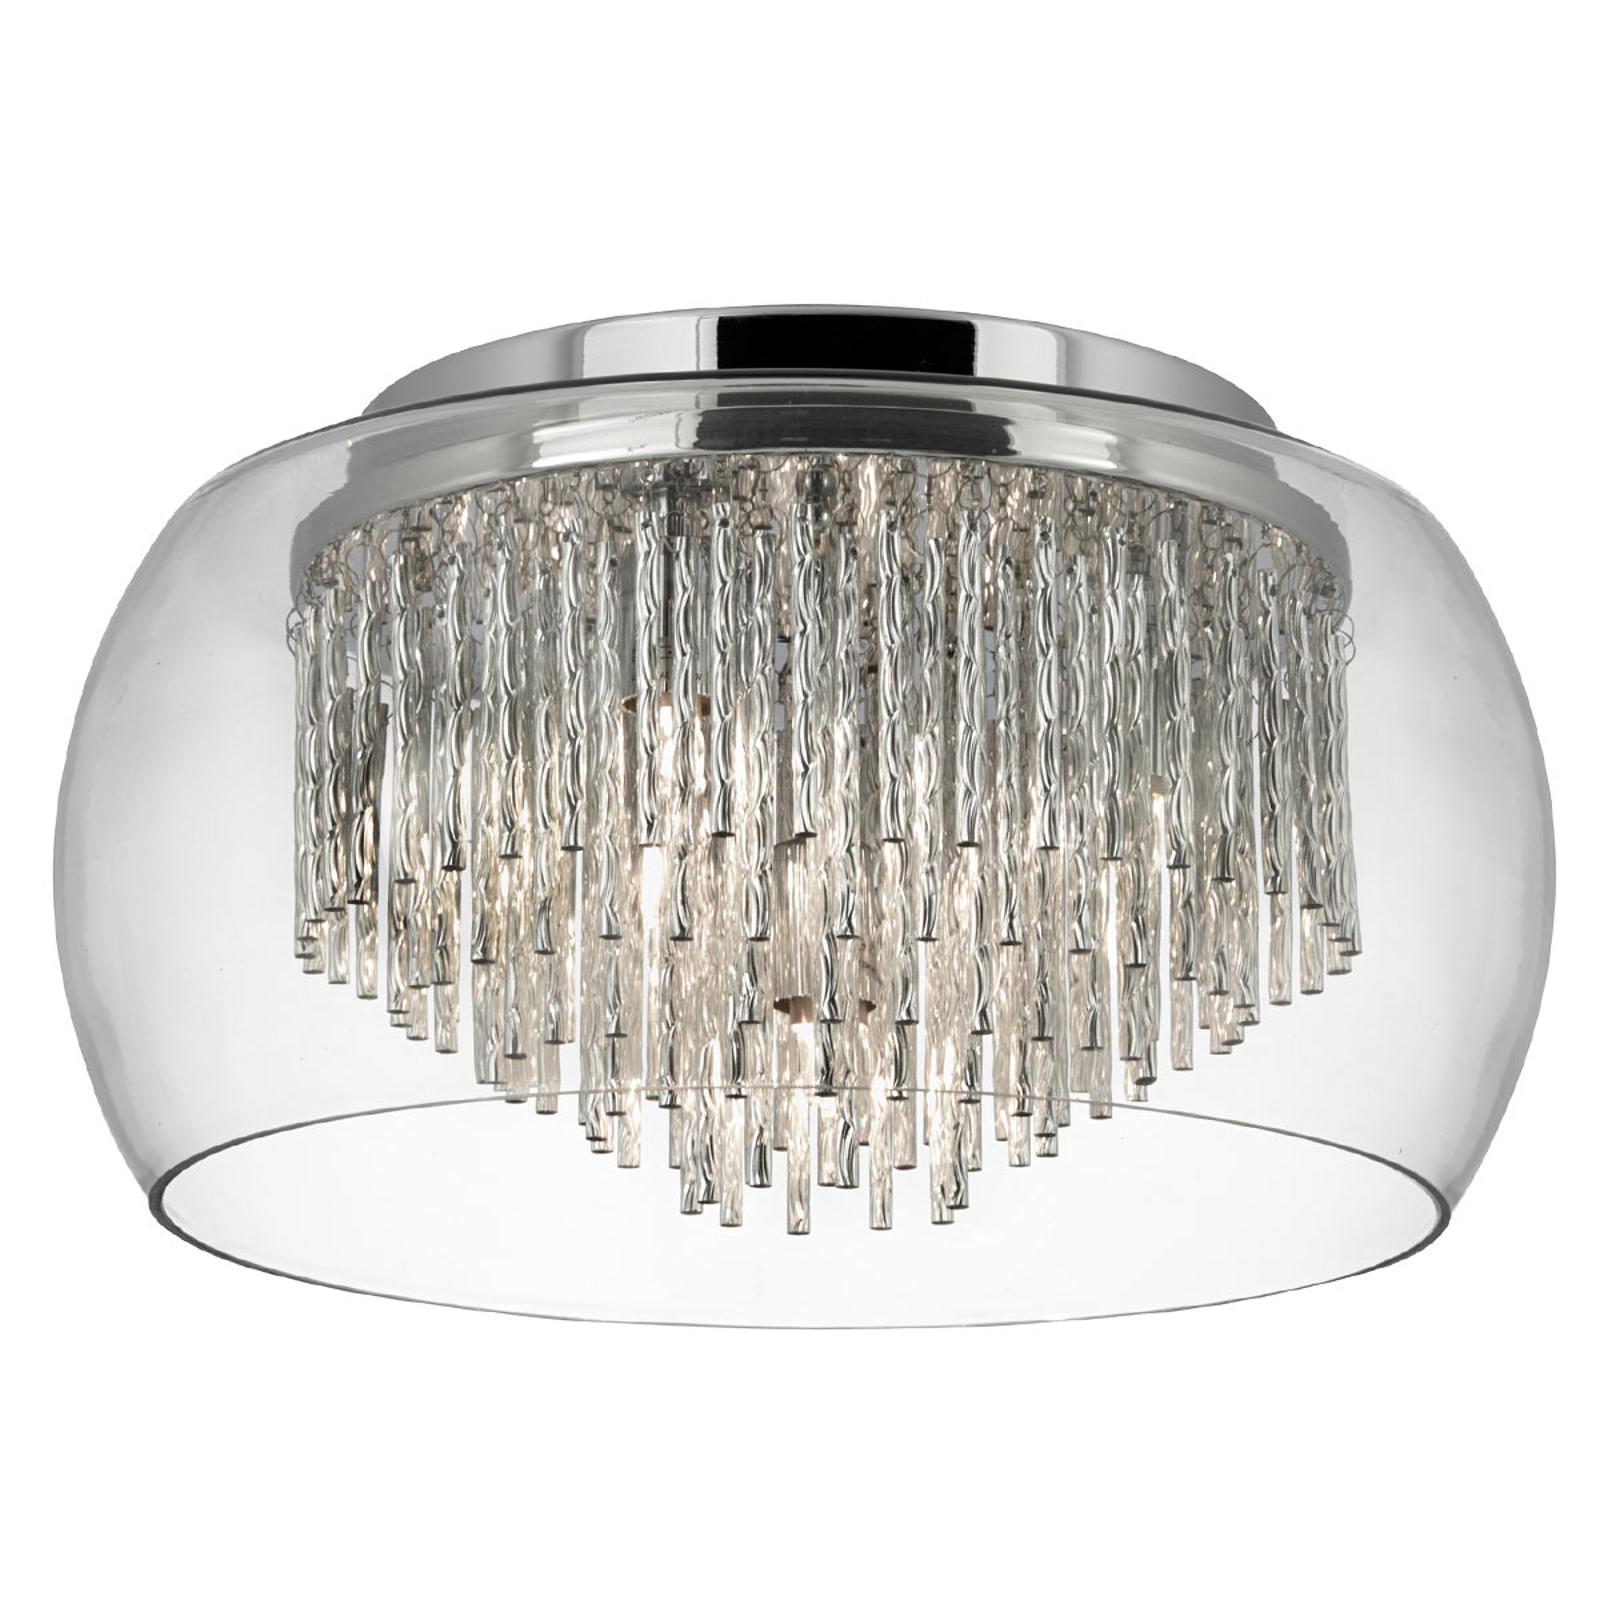 Lampa sufitowa 4624 z aluminiowymi spiralami